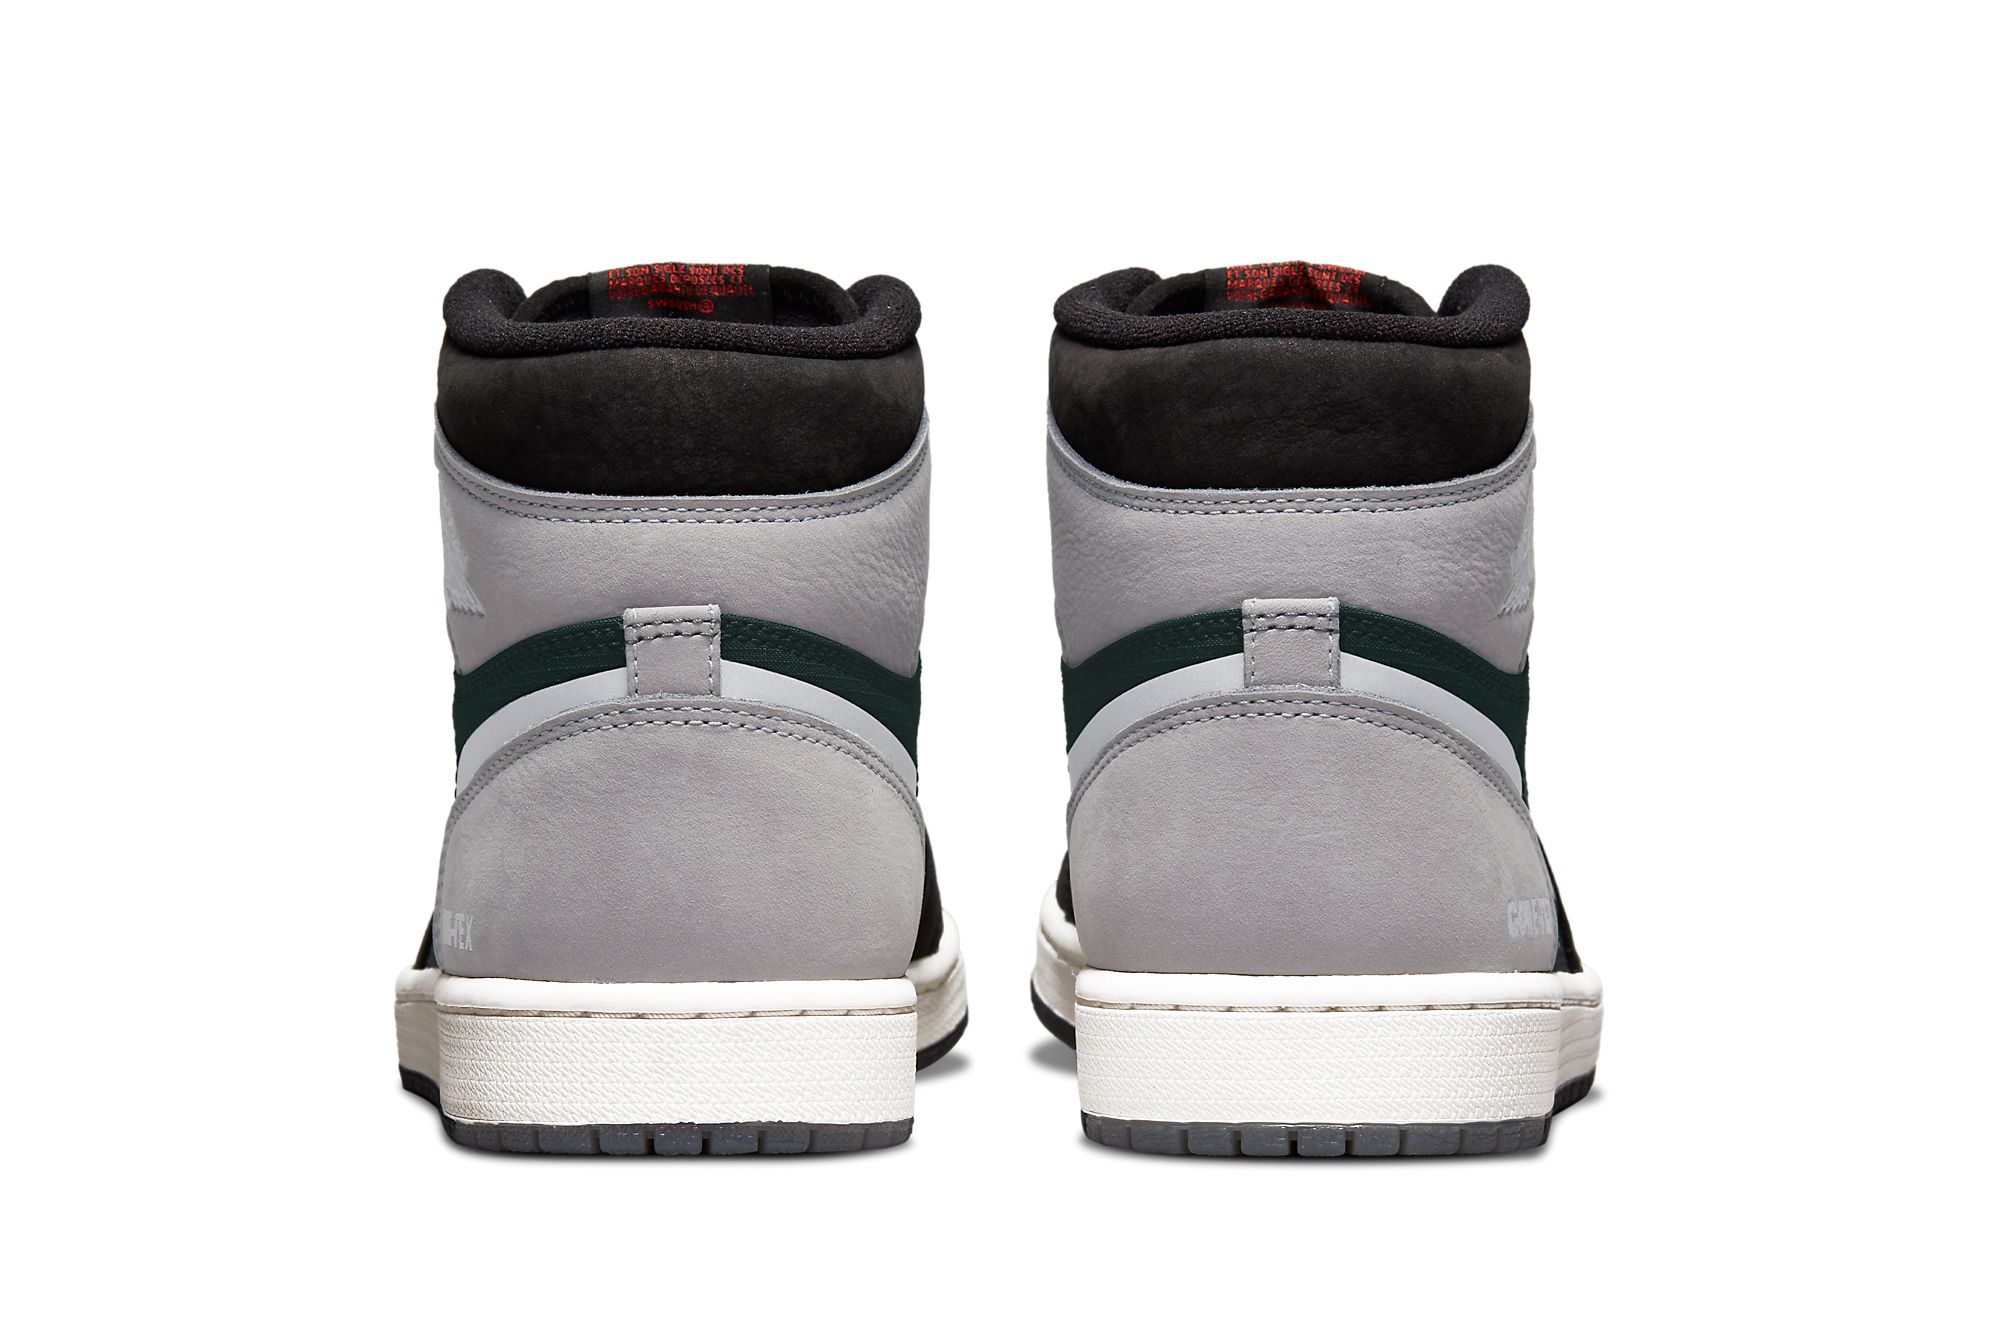 Air Jordan 1 Element GORE-TEX 'Black/Grey'